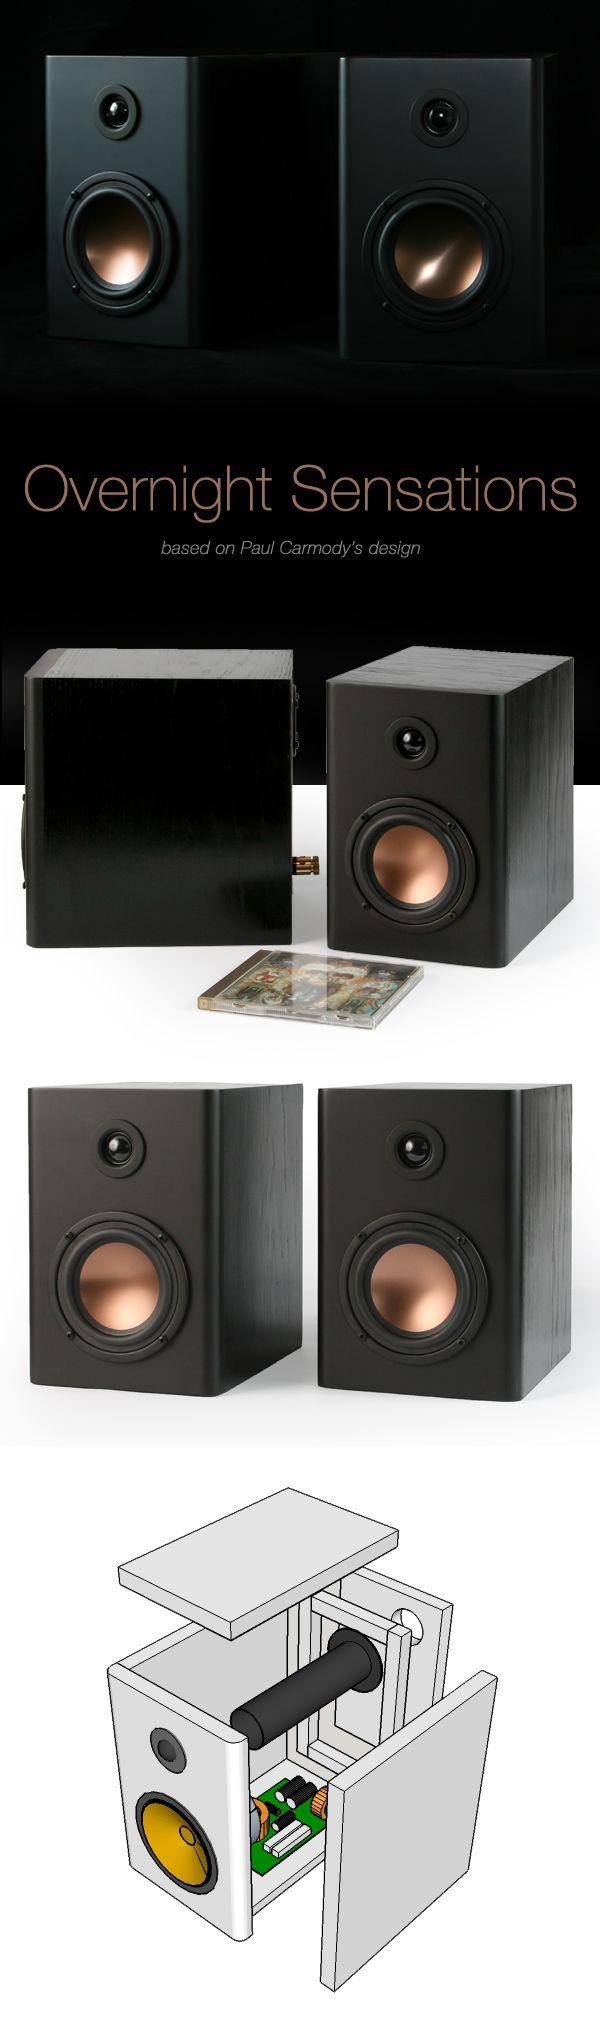 Overnight sensations my first diy speaker build great sounding bookshelf speakers enclosure 16mm mdf